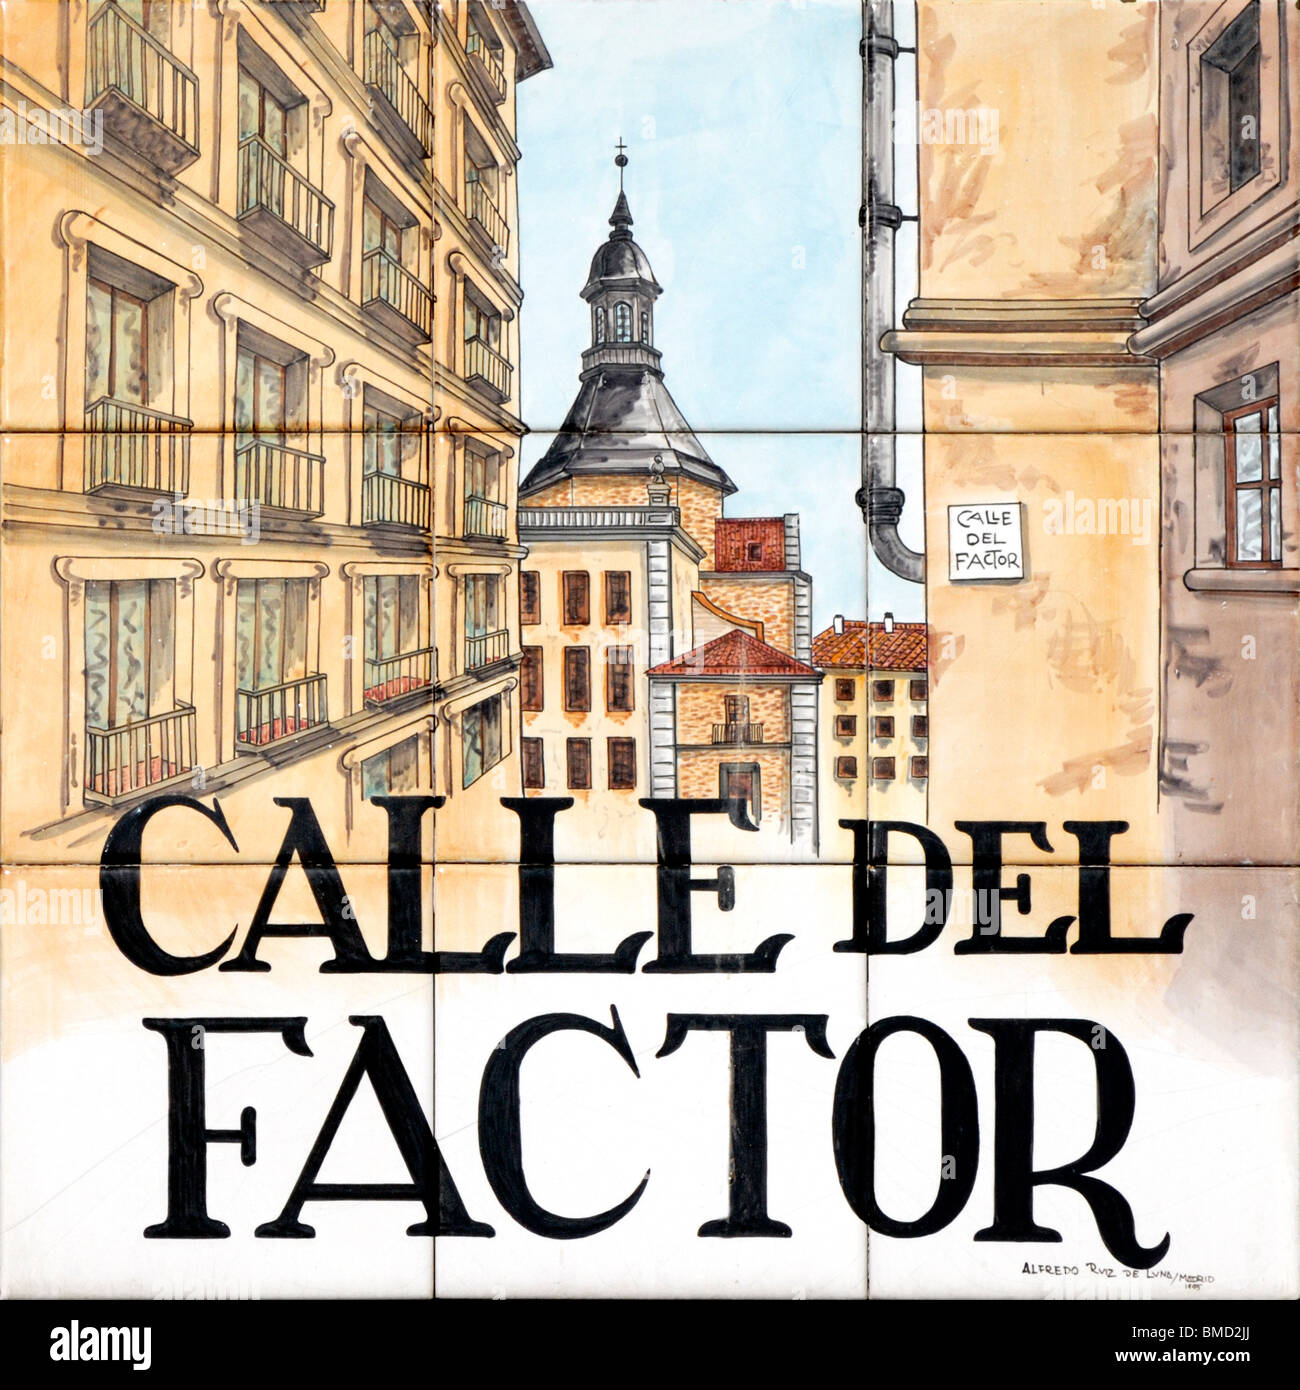 Madrid, Spain. Traditional Tiled Street Sign. Calle del Factor (by Alfredo Ruiz de Luna / Madrid) - Stock Image